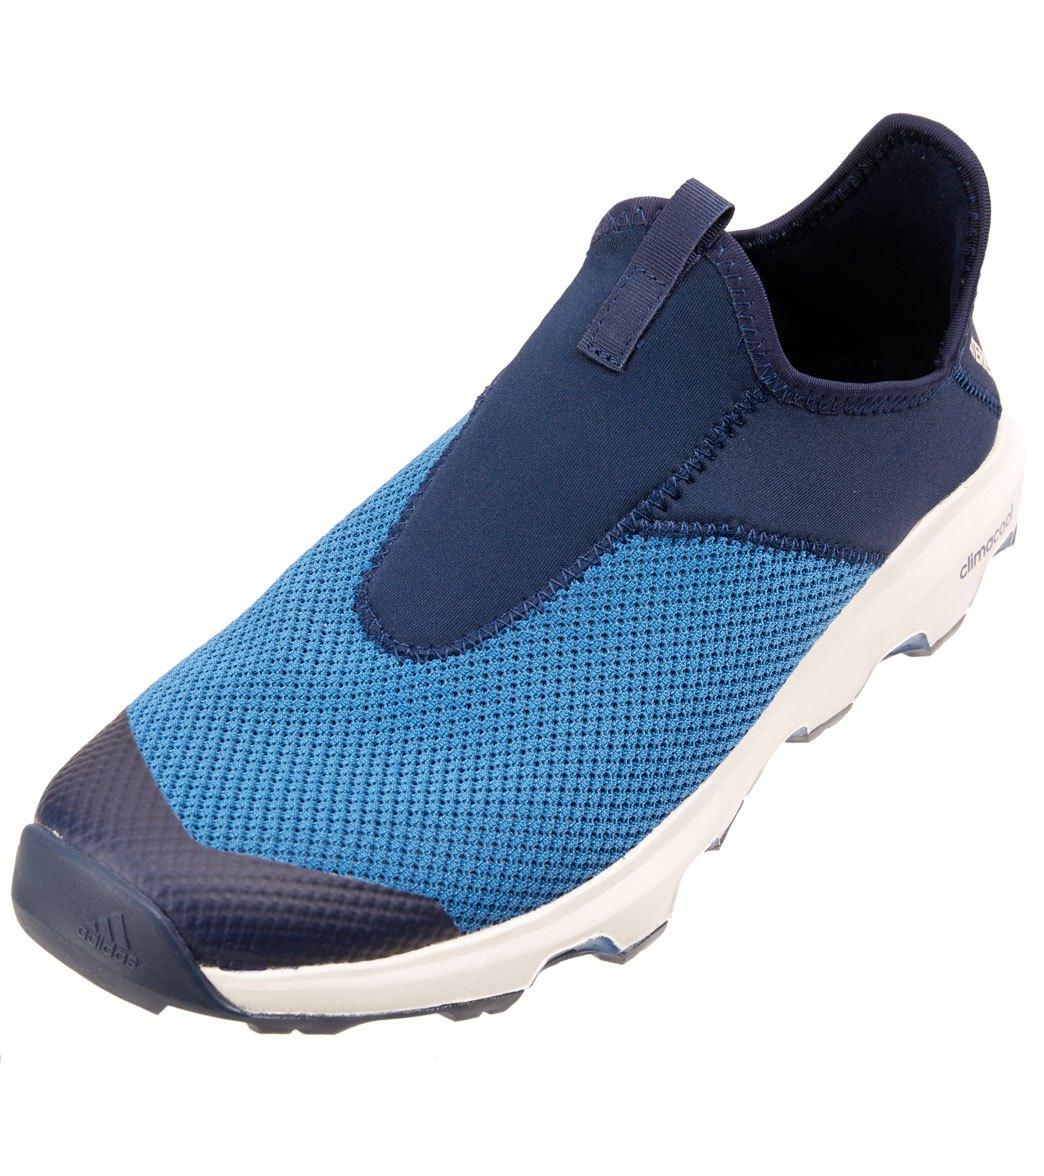 ... Adidas Men s Terrex Climacool Voyager Slip On Water Shoe. Share d65f9375f8da